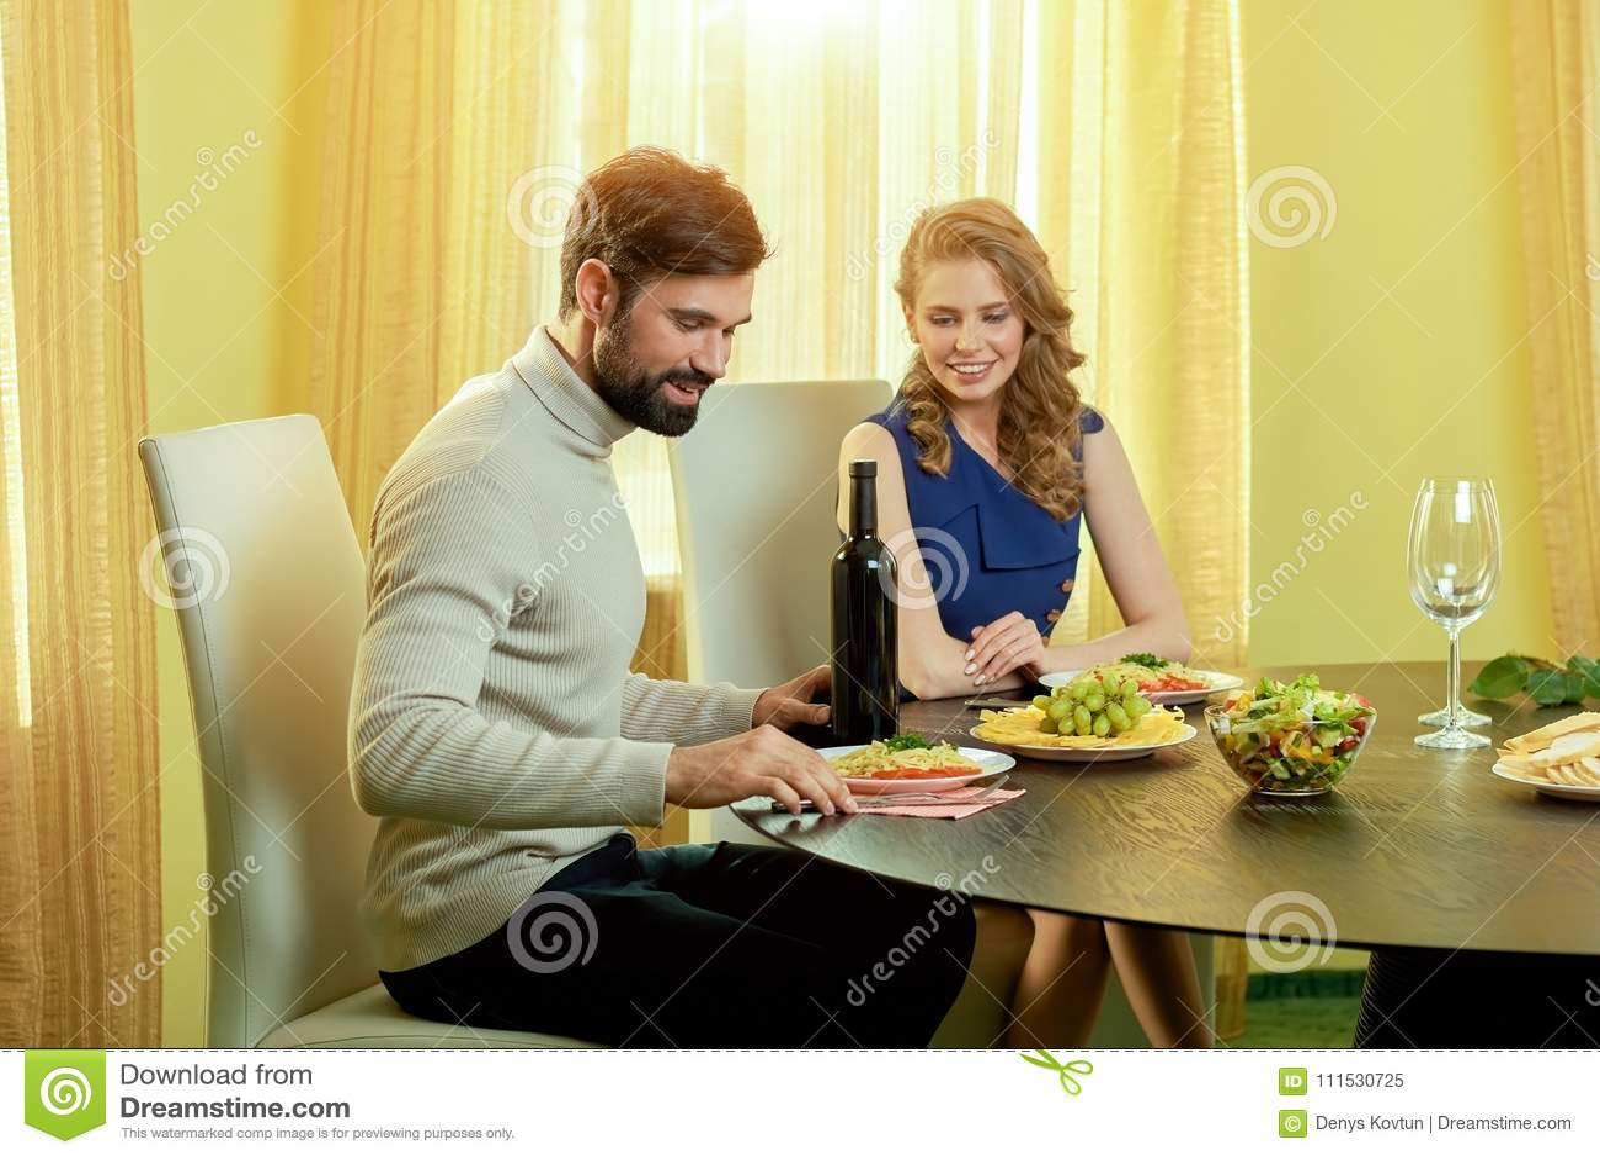 Start dating senior year